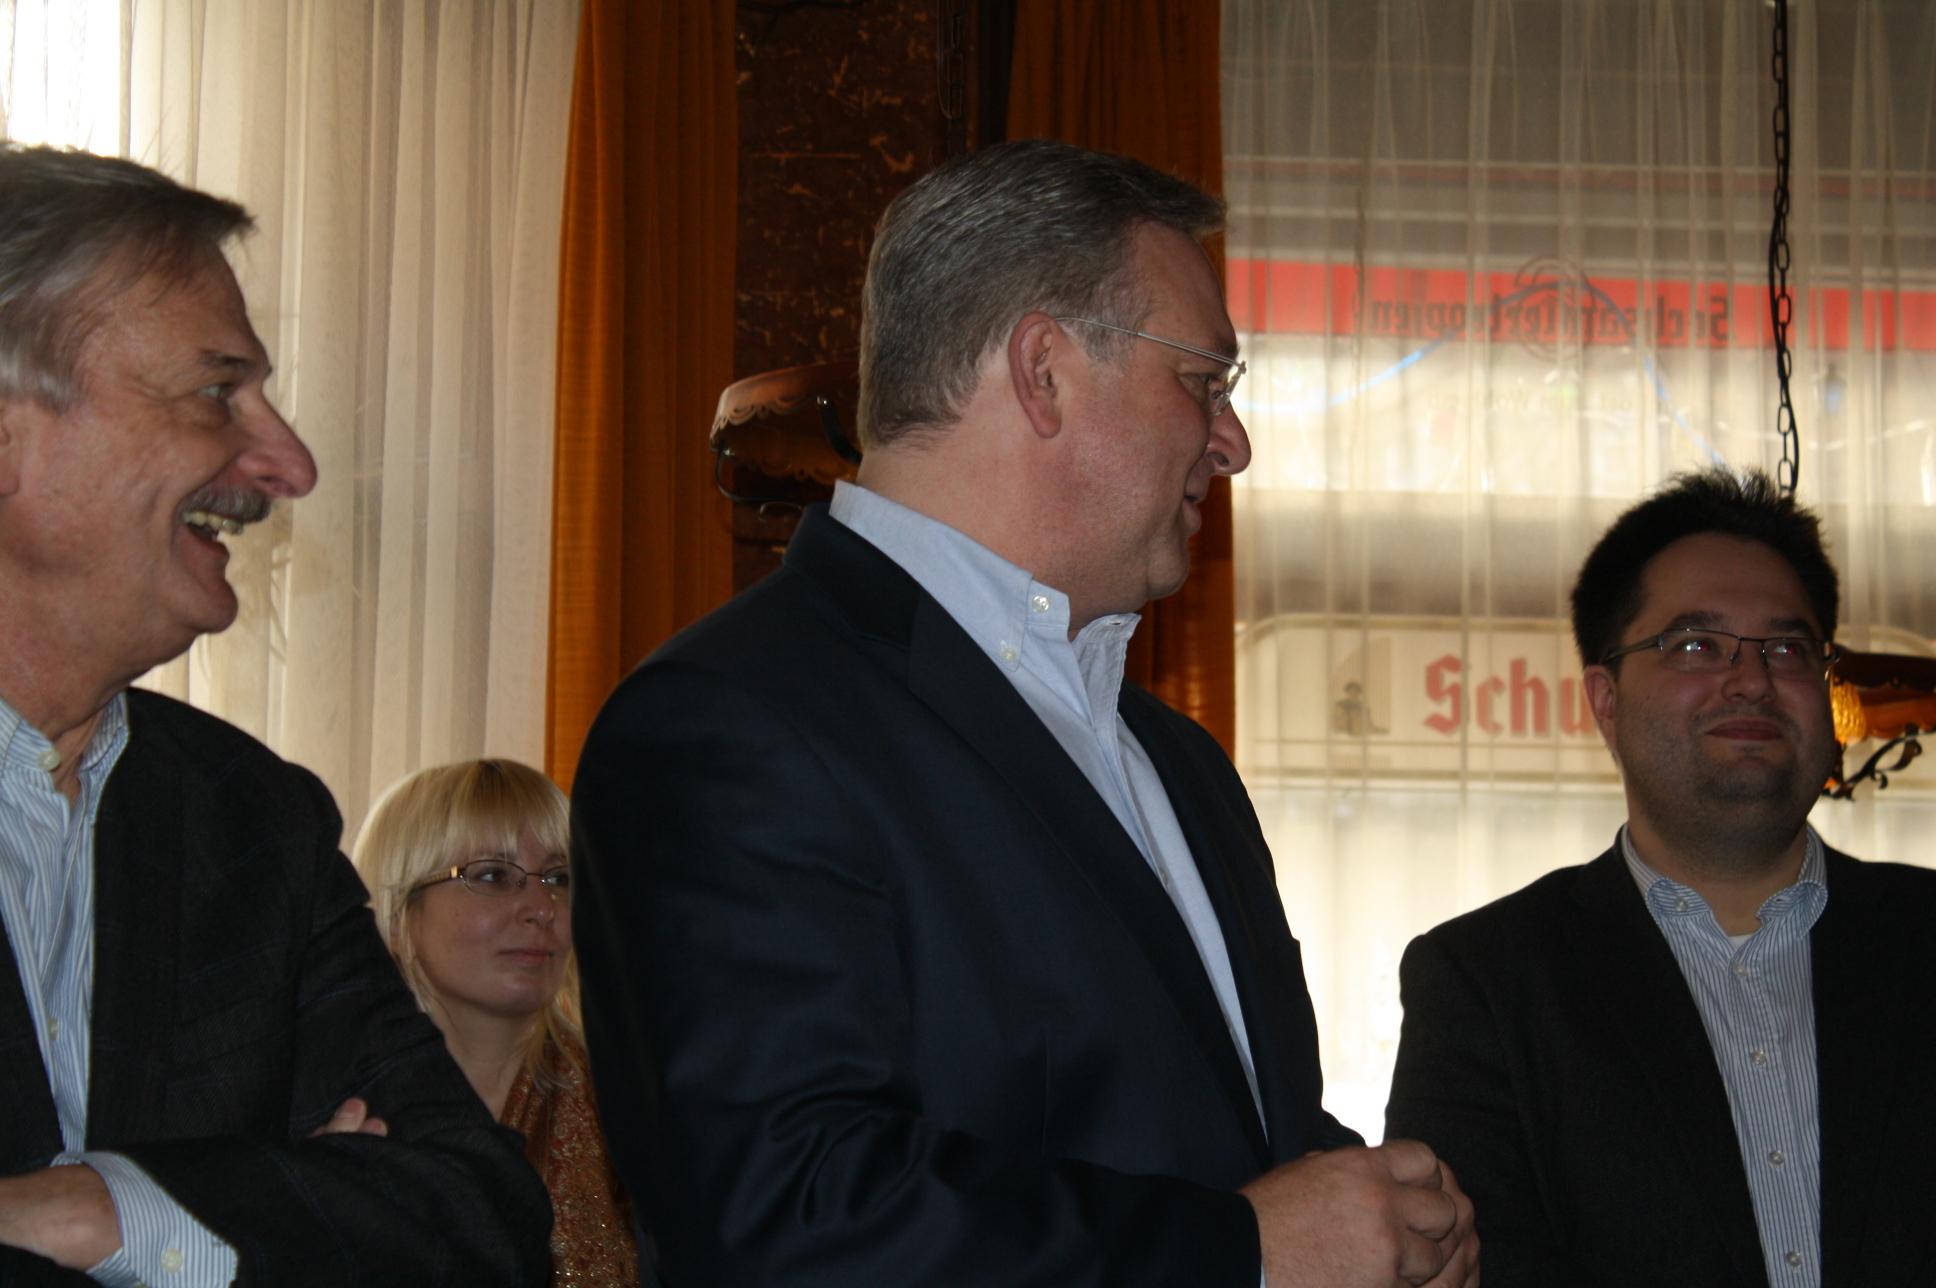 v.l.n.r. Volker Liepelt, Frank Henkel, Olaf Lemke